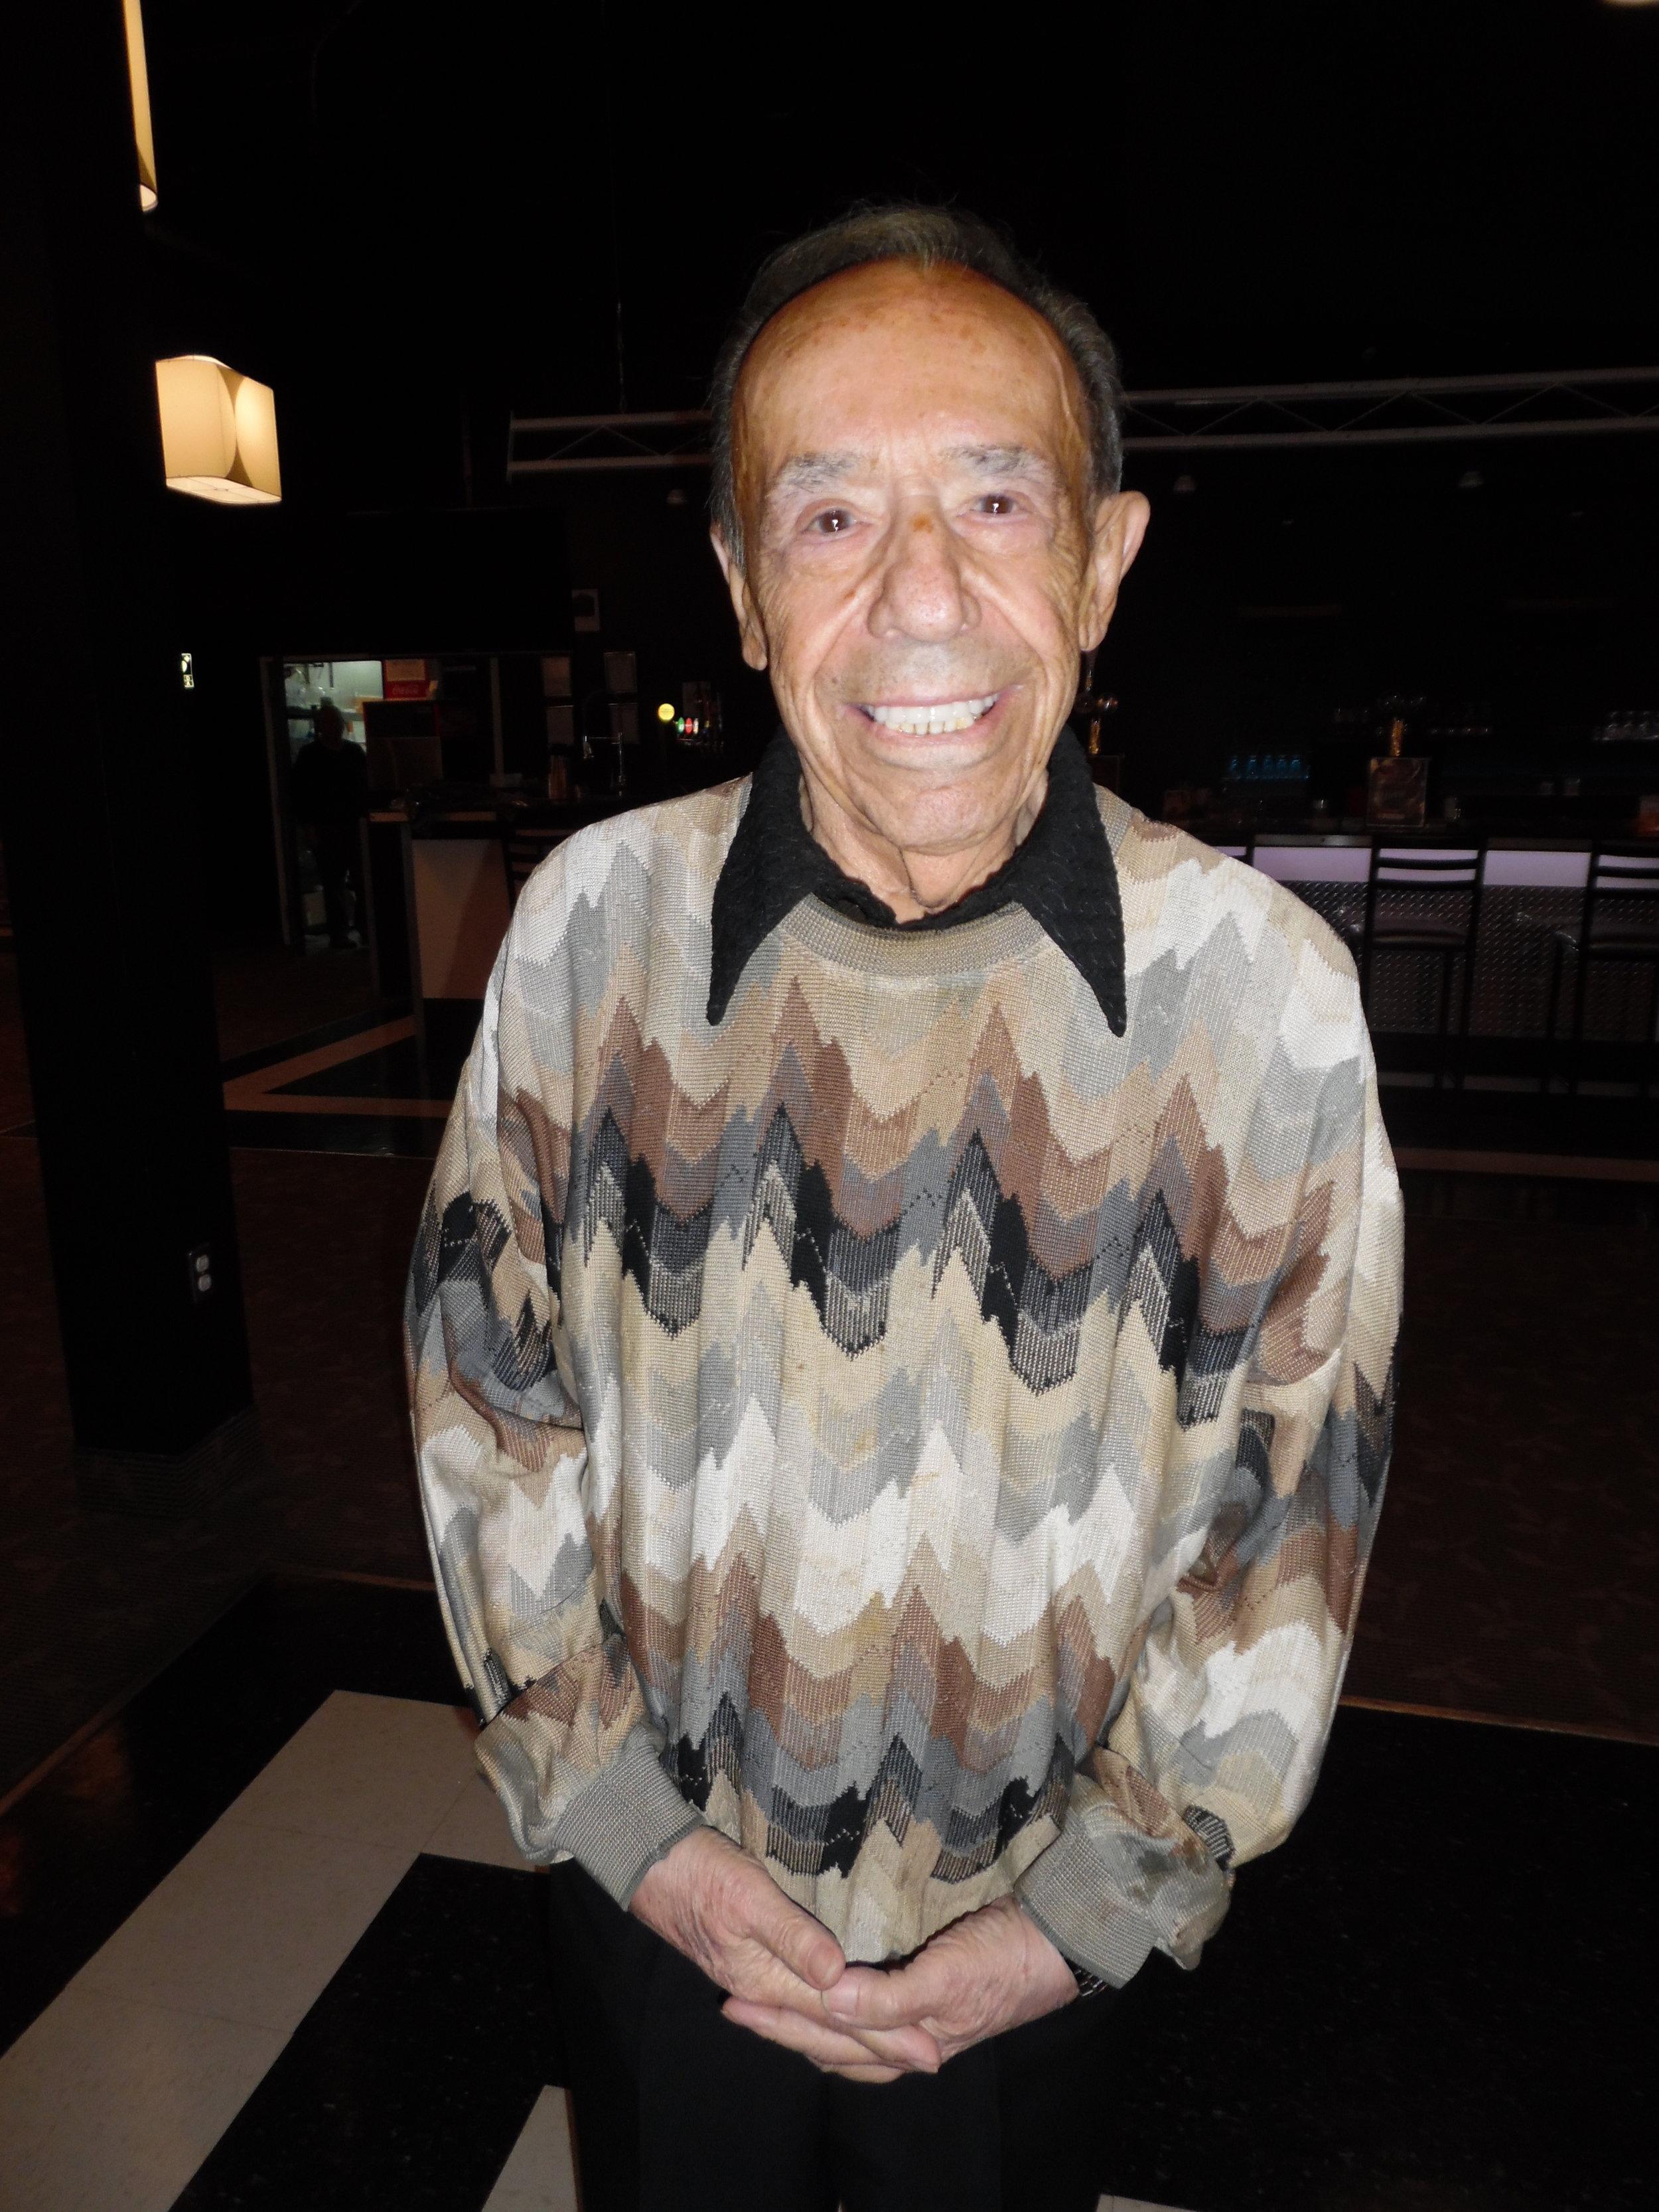 Frank Busseri at the Niagara Falls Elvis Festival in 2018.  Photo Credit: C. MacArthur.